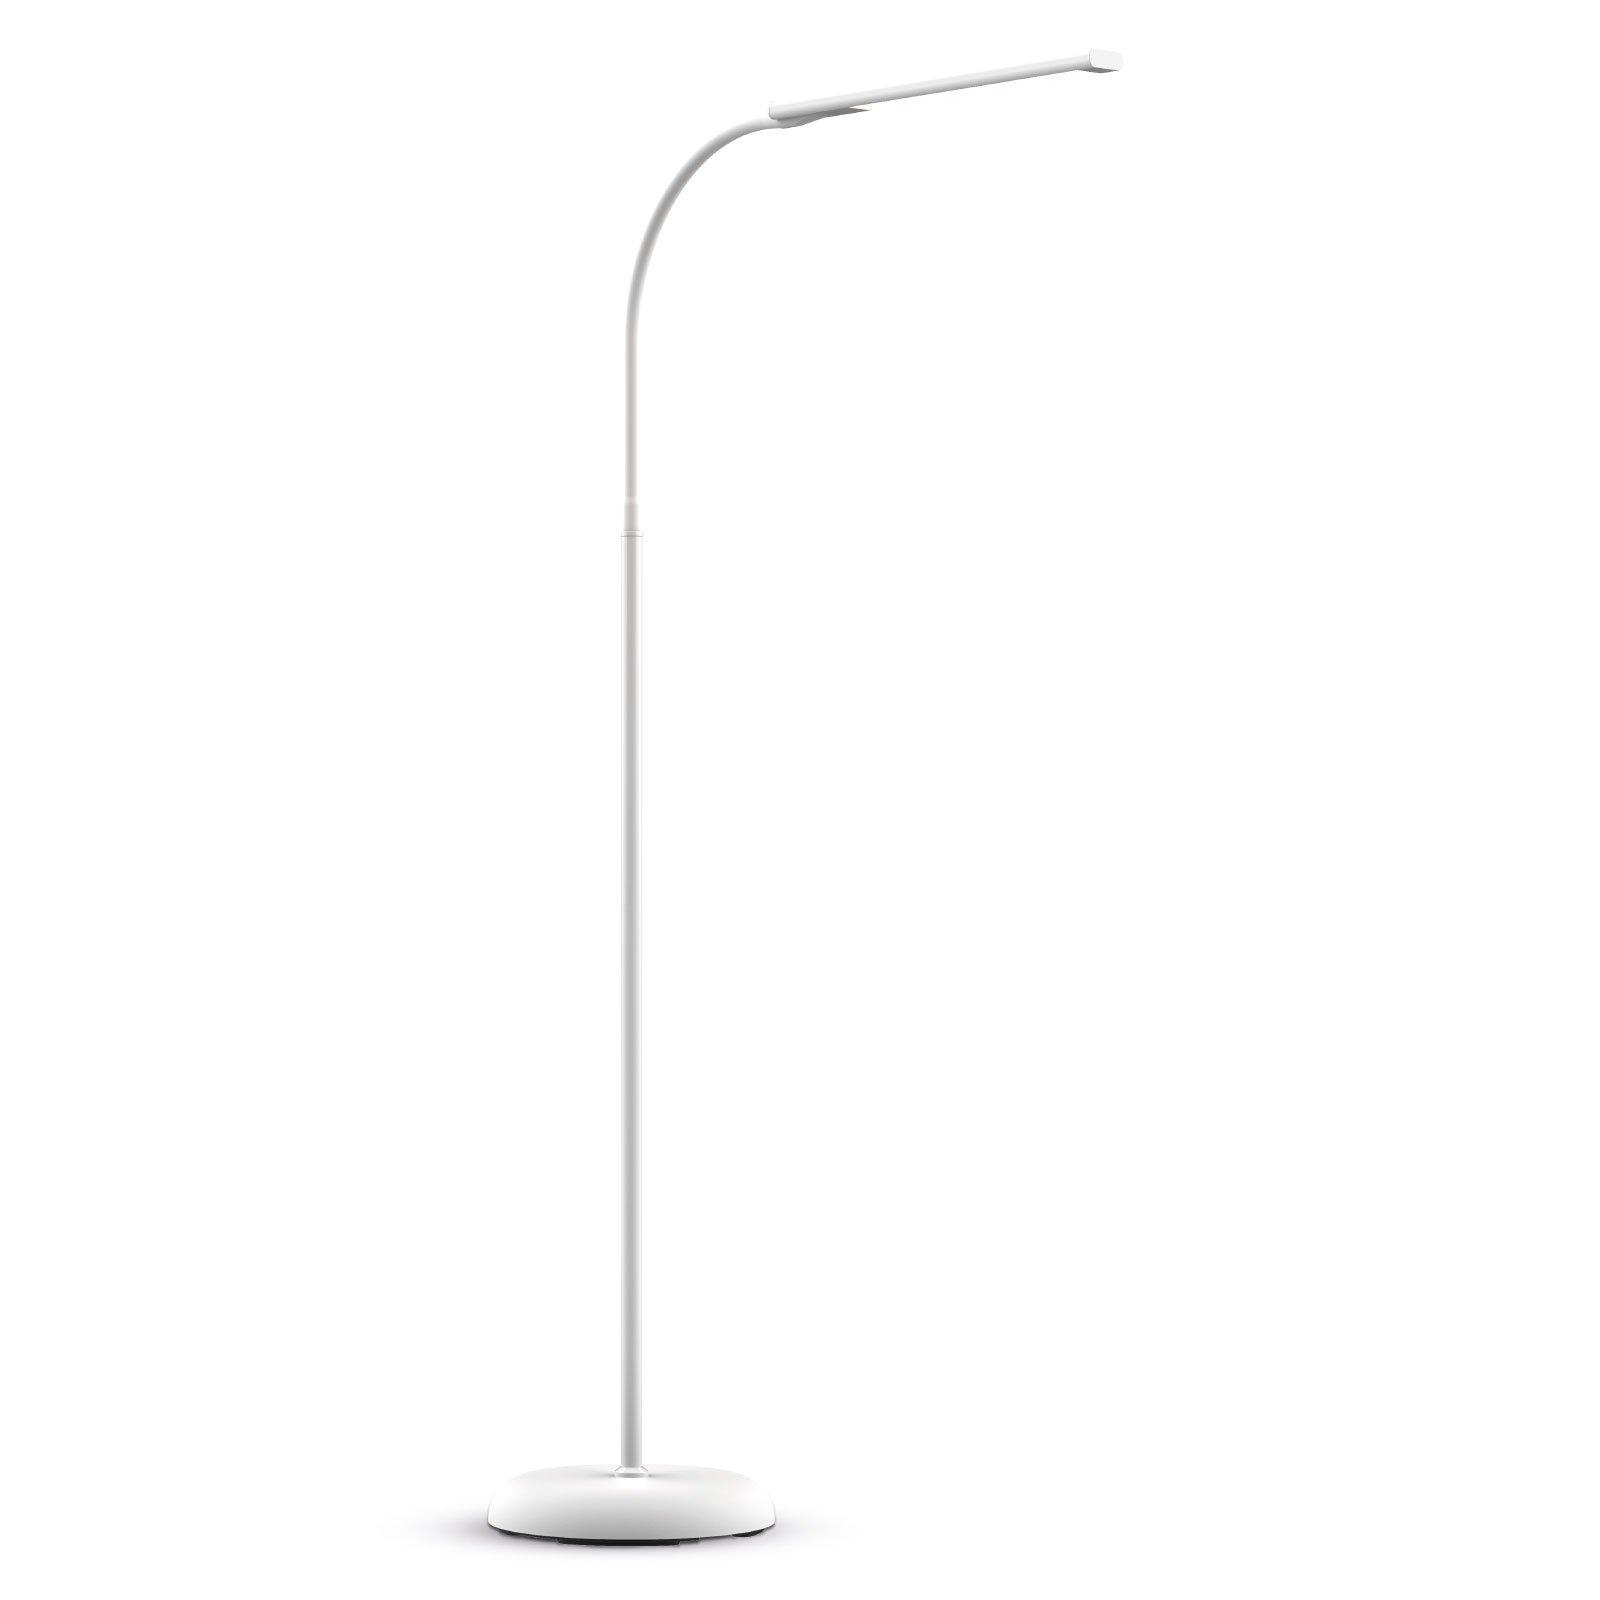 MAULpirro LED-gulvlampe dimbar, hvit